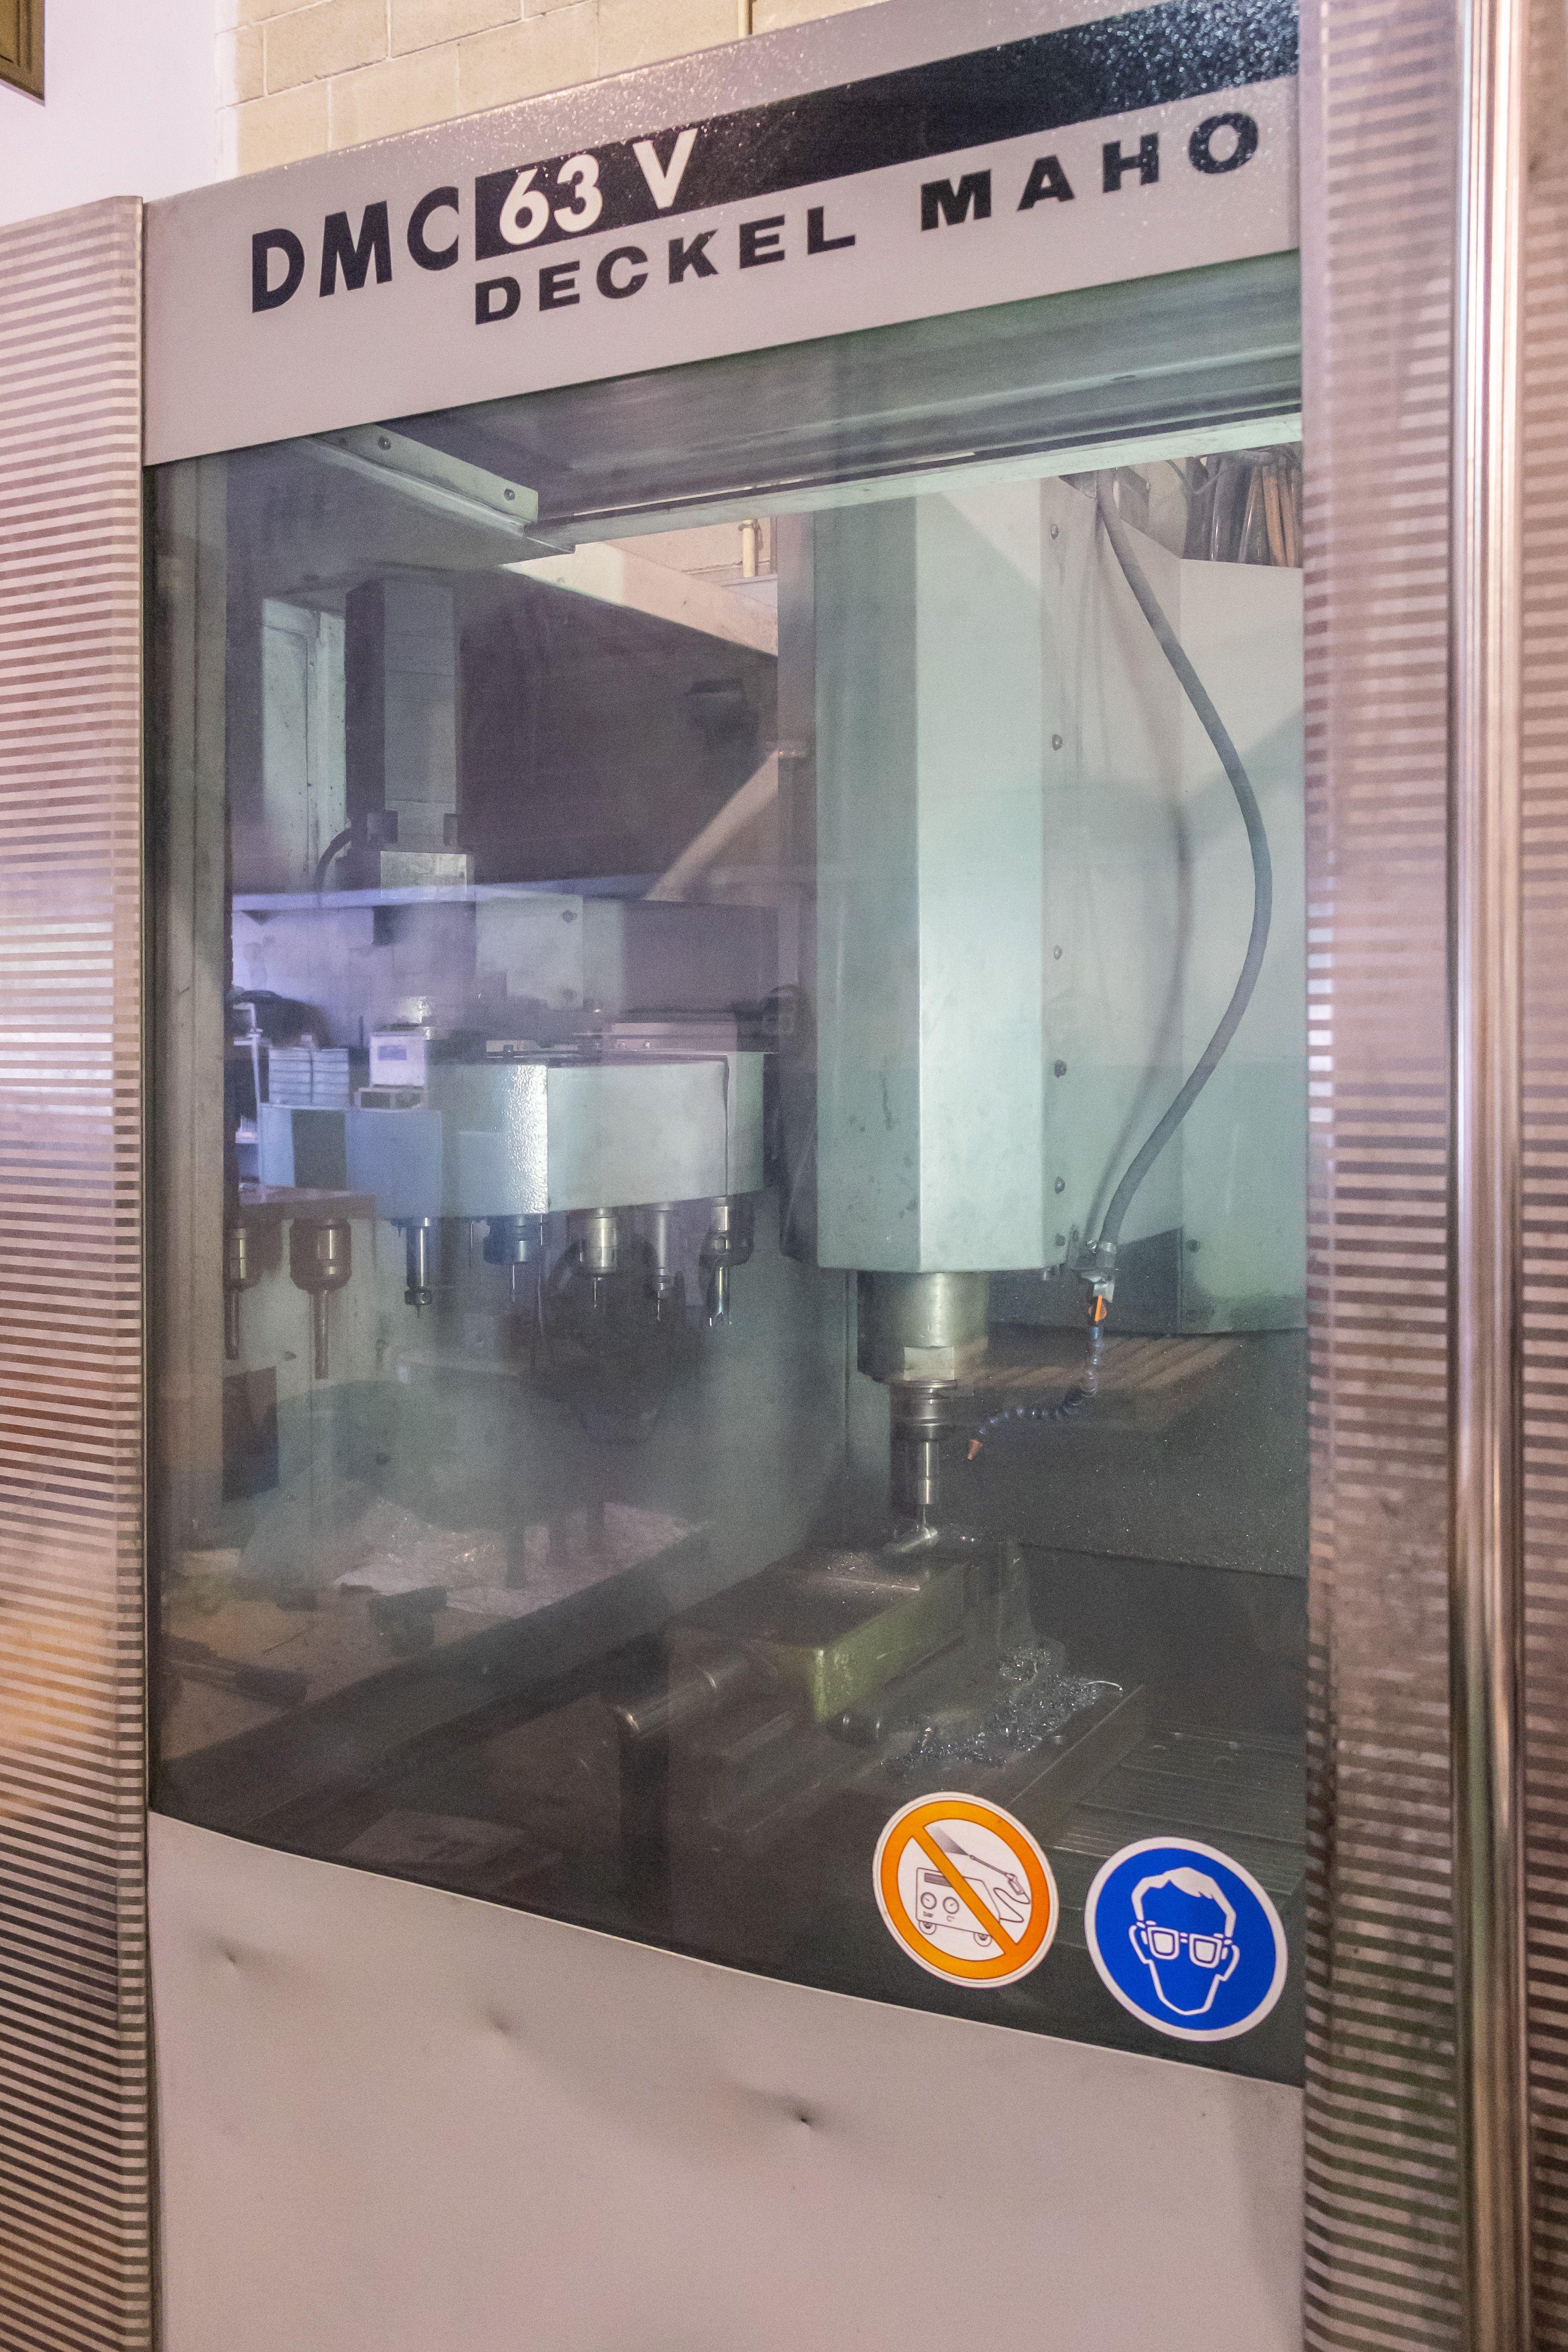 Maquinaría industrial Visamol en Baix Llobregat